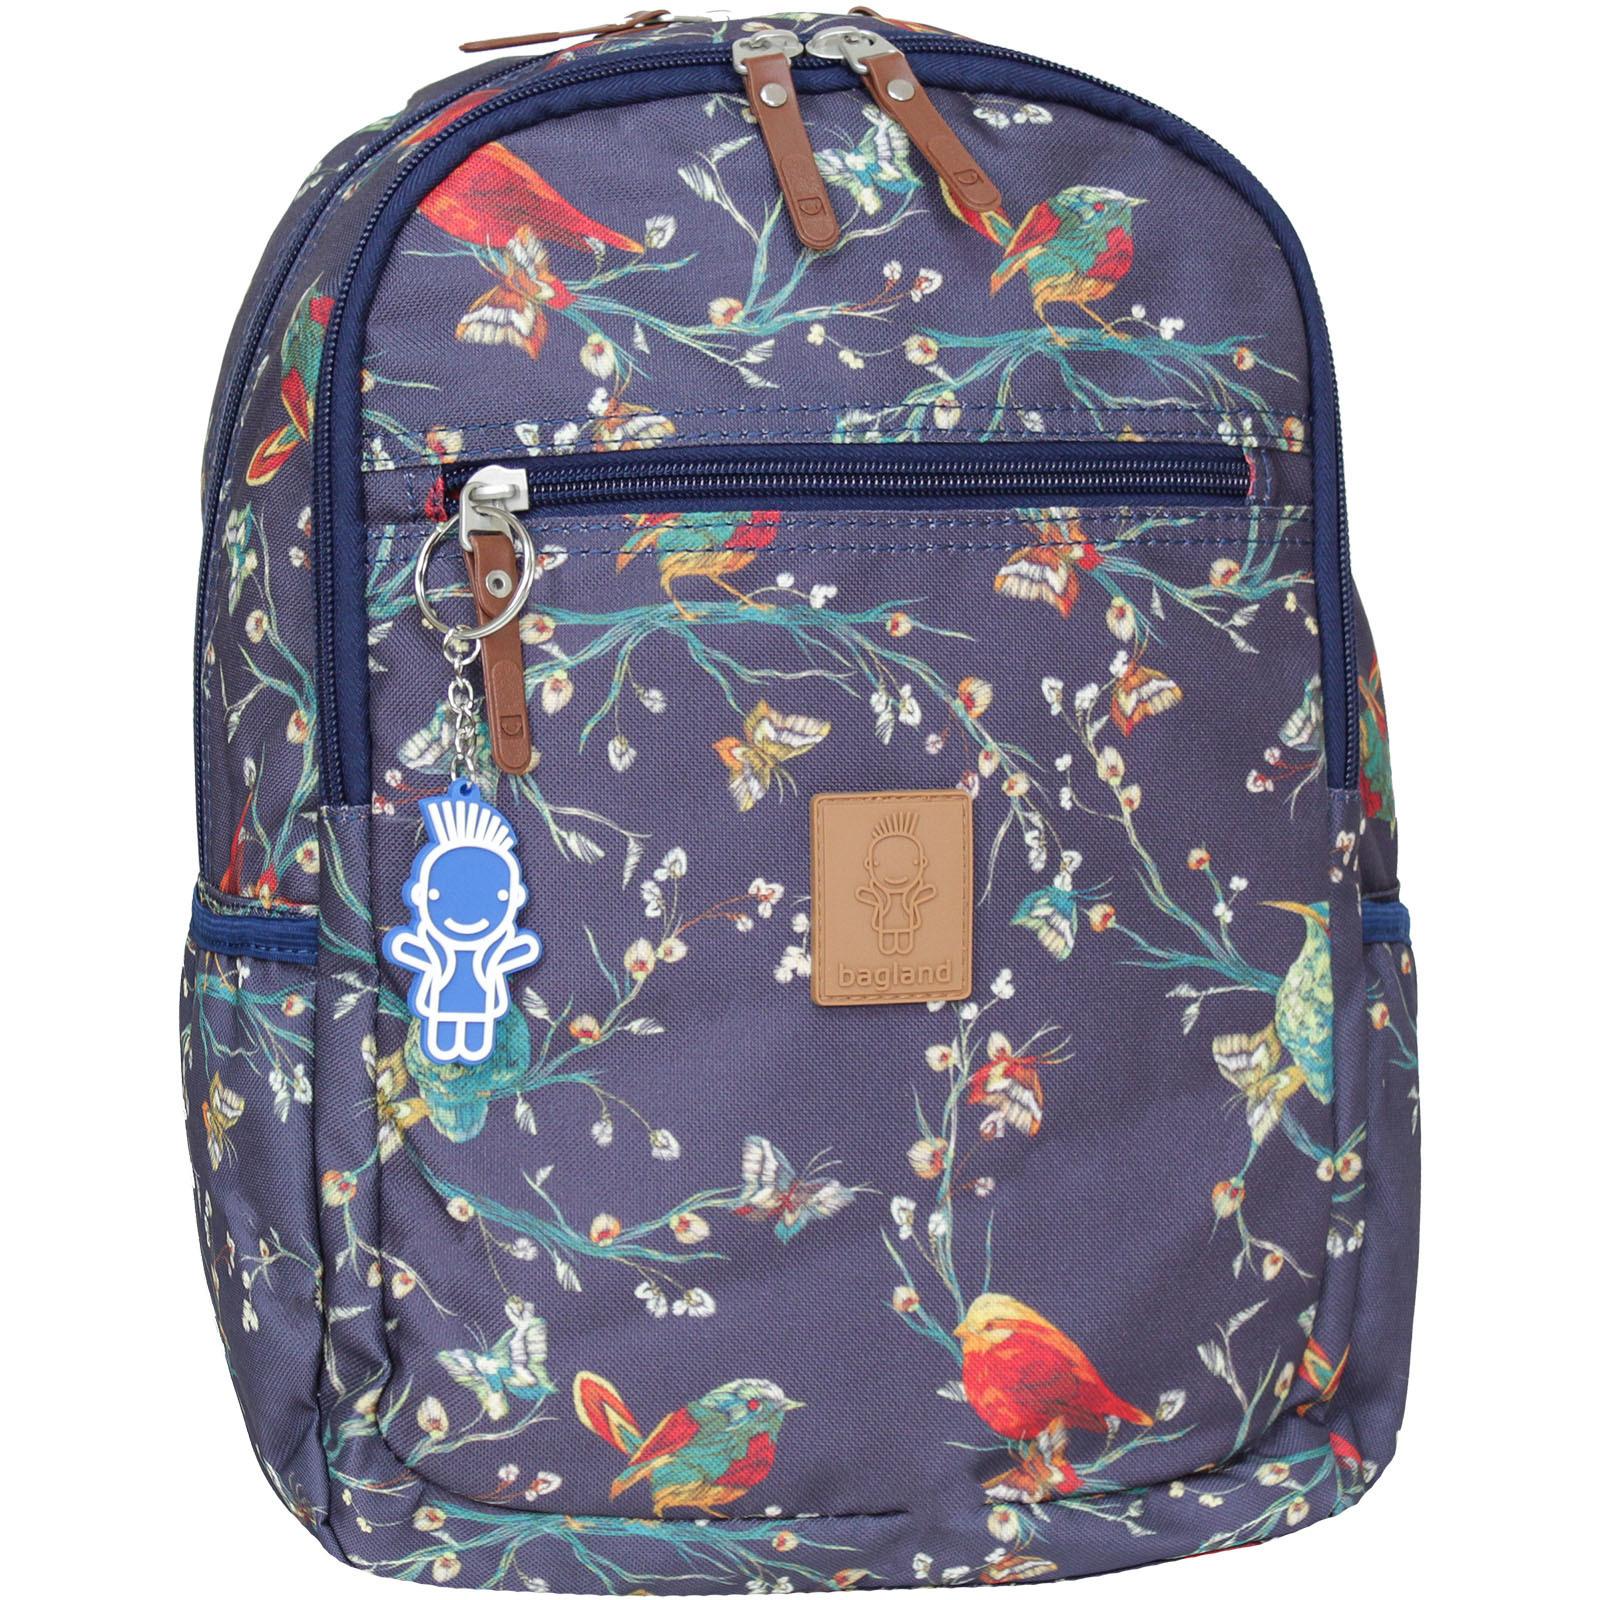 Детские рюкзаки Рюкзак Bagland Young 13 л. сублімація 160 (00510664) IMG_8713-1600.jpg